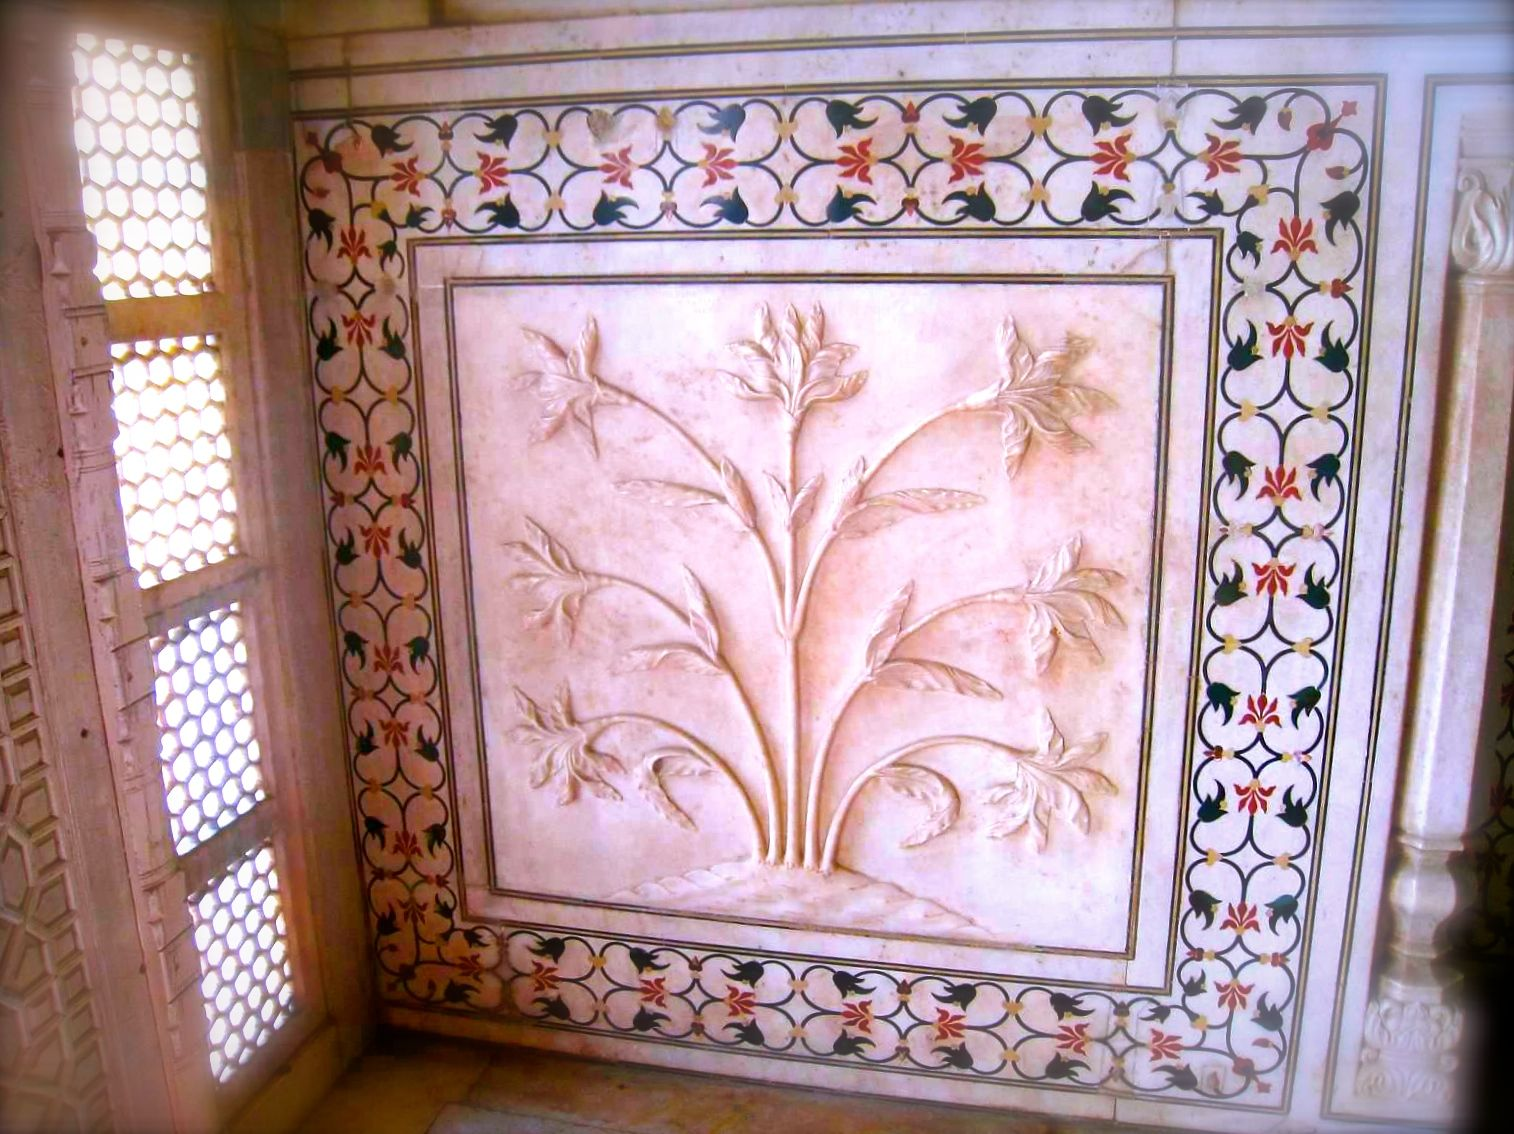 Taj Mahal - interior - detail, detail, detail and the talent ...